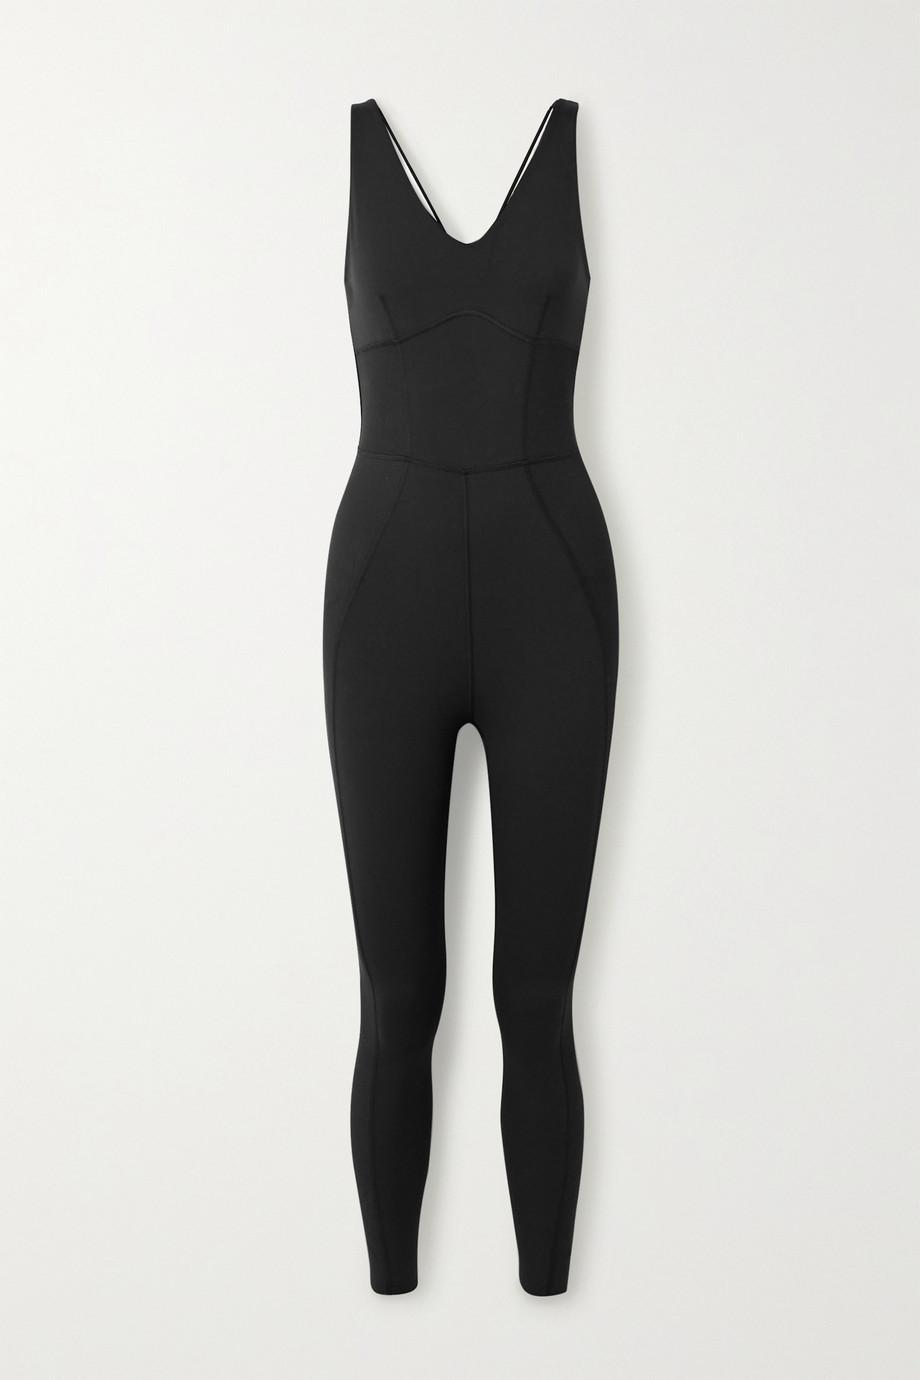 Nike Yoga Luxe Dri-FIT stretch bodysuit